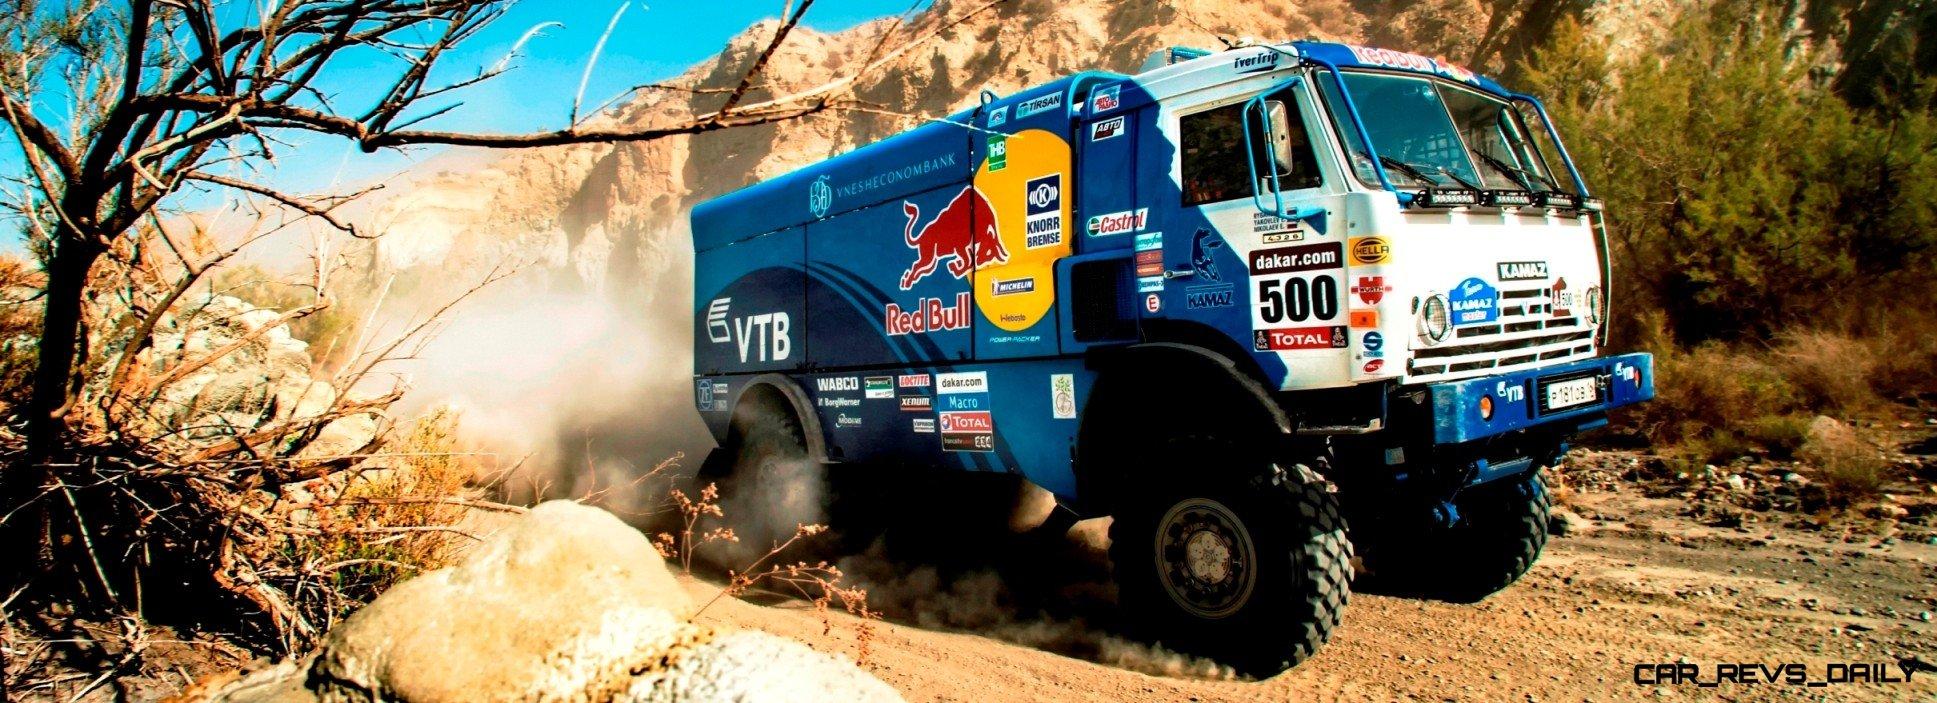 Chagin & Nikolaev + Kamaz truck performs during pre shoots 2014 Dakar Team Activations